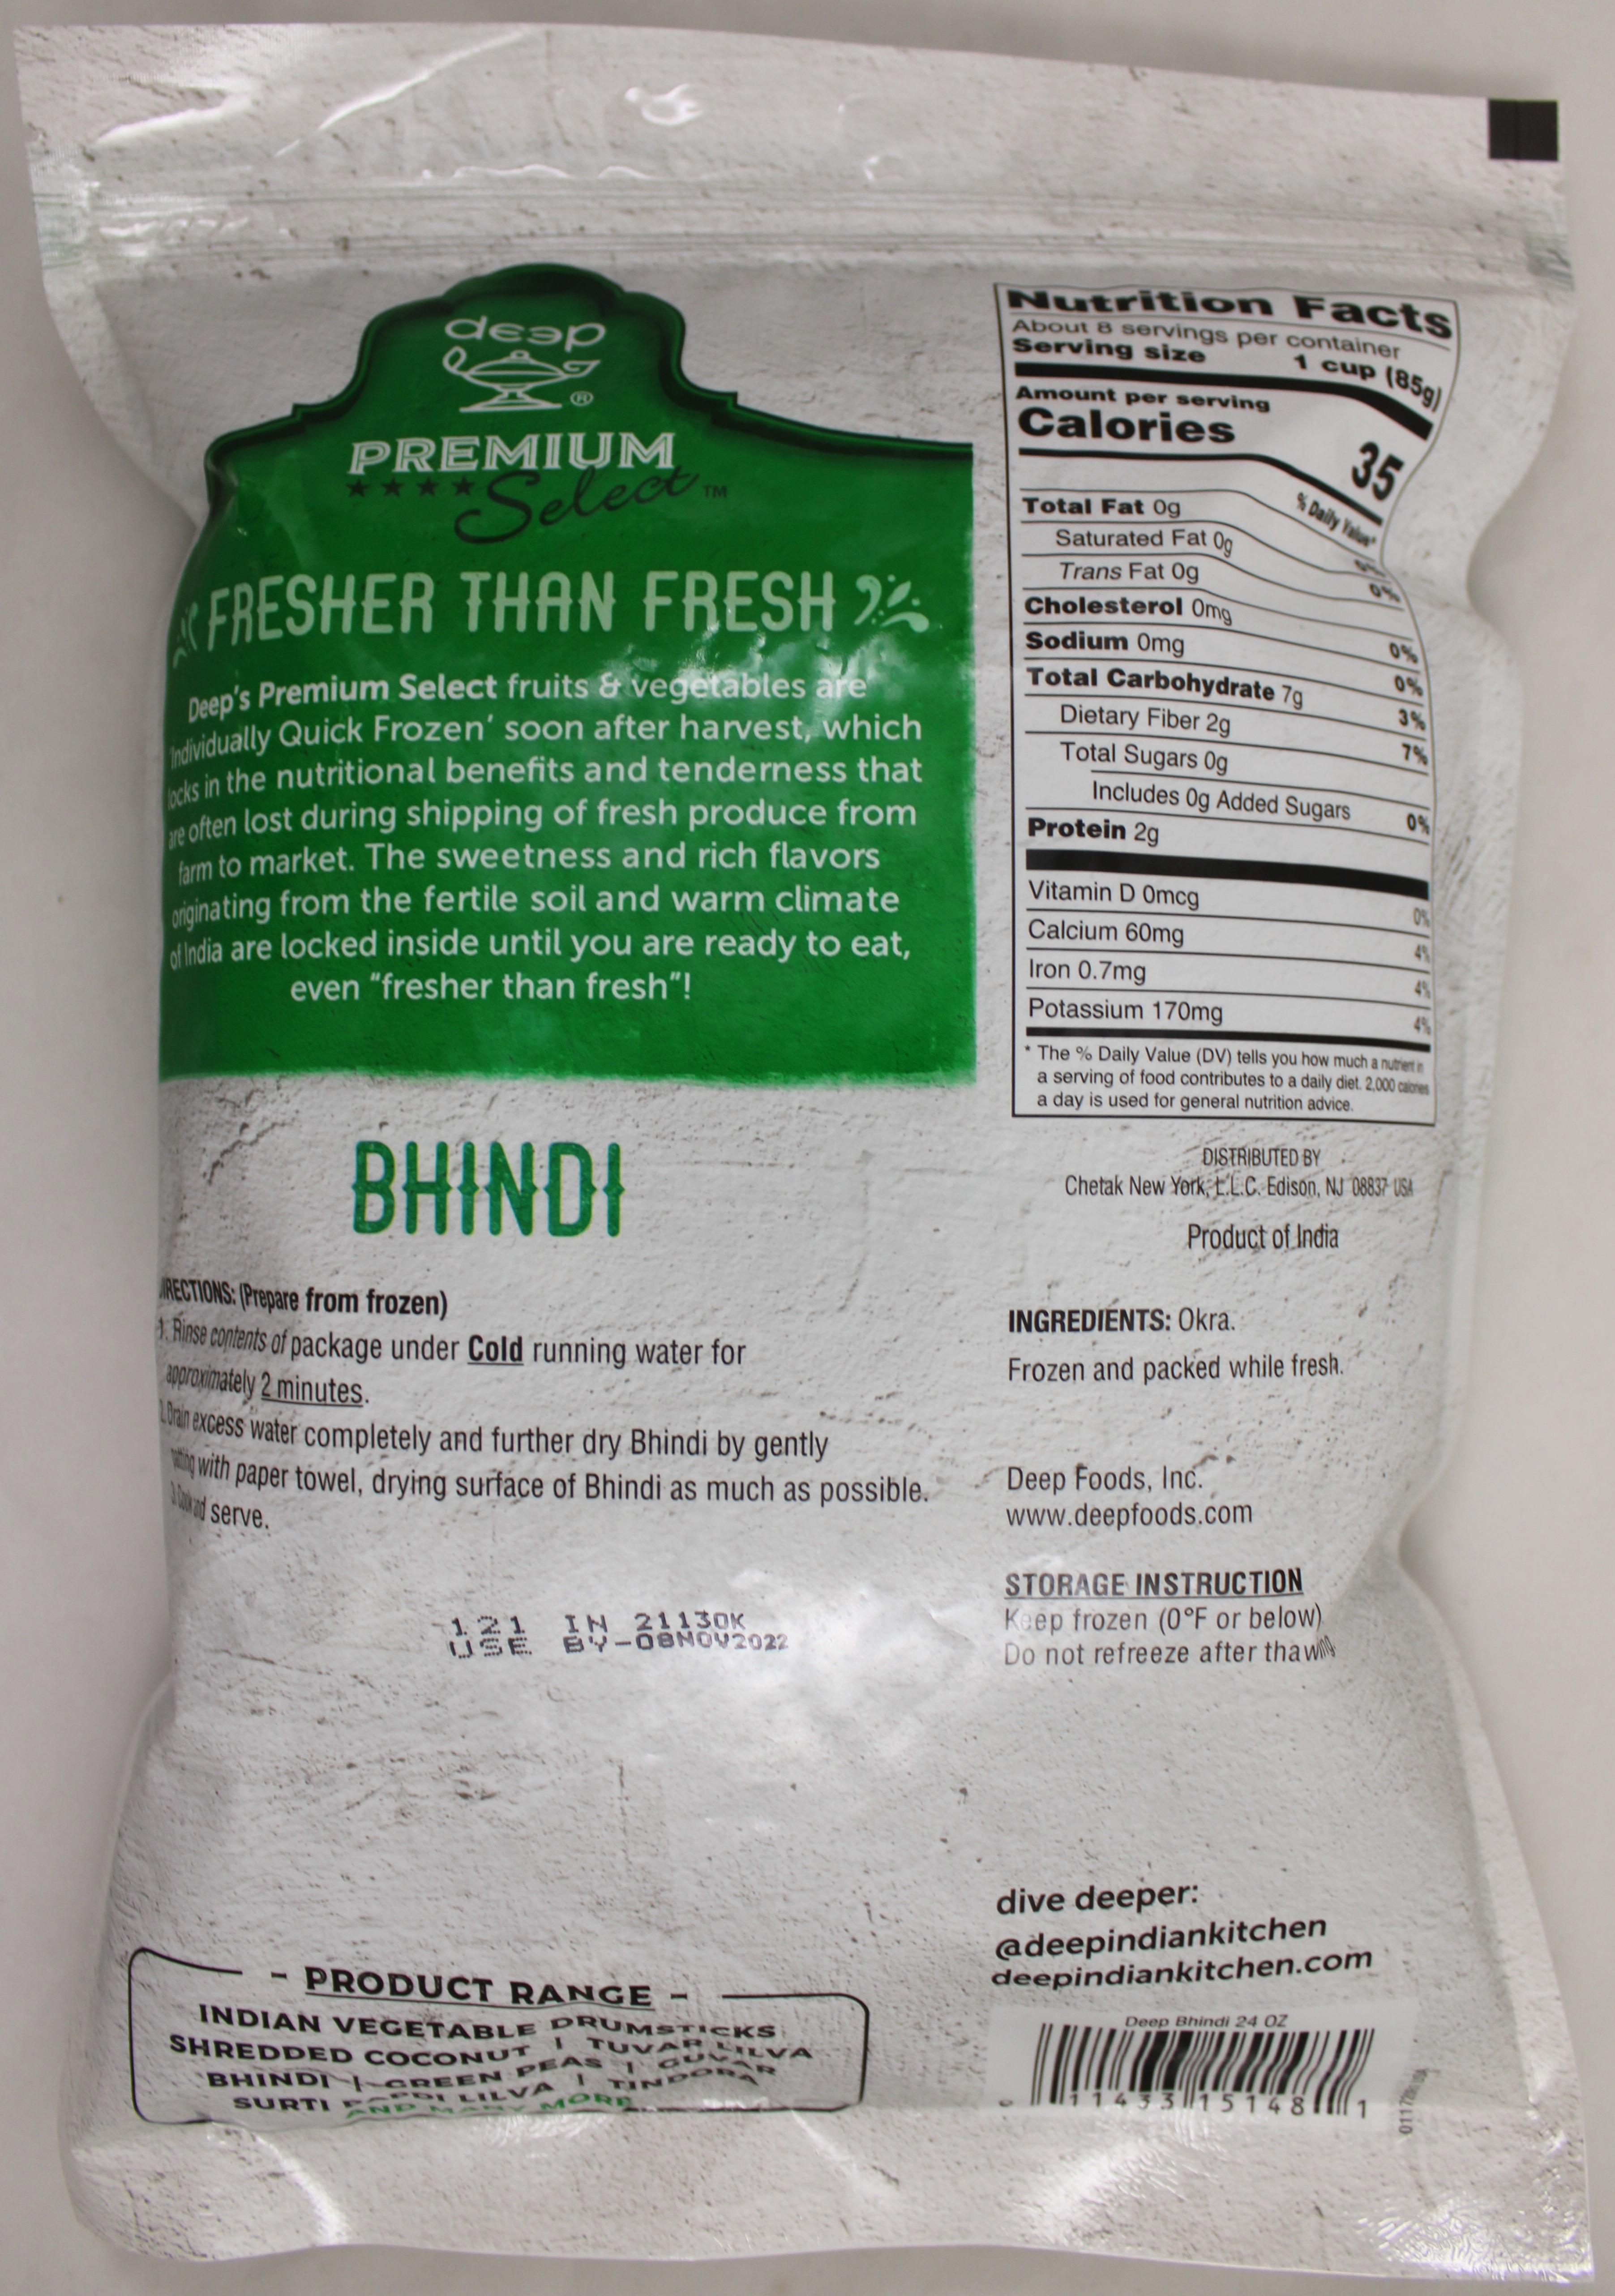 Bhindi Cut (Okra) Frozen 24oz